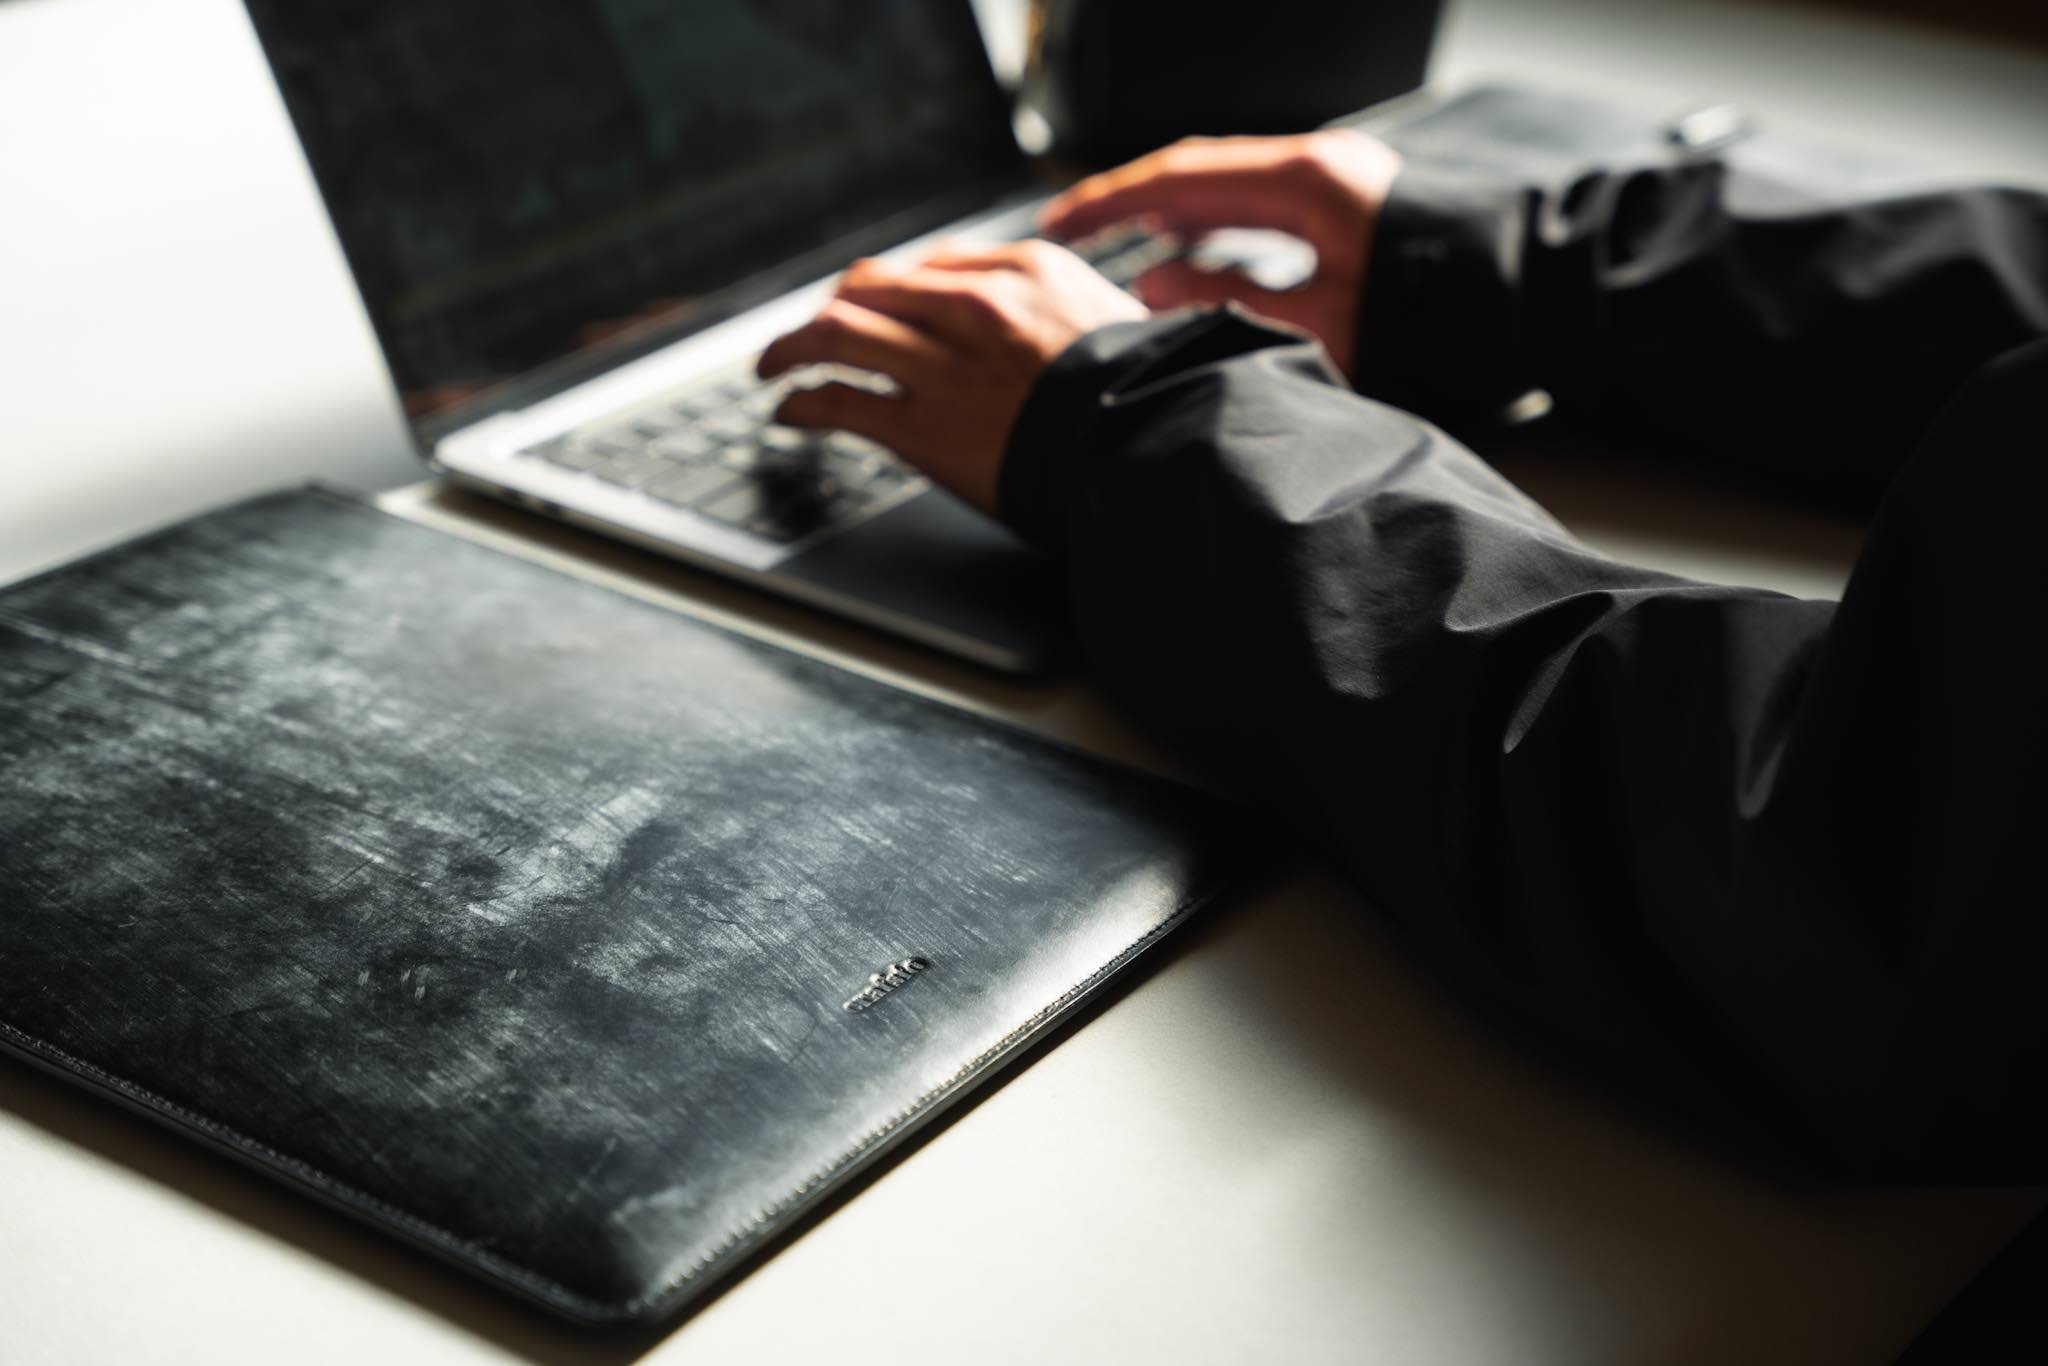 crafsto(クラフスト) MacBook用スリーブケース|「毎日高まる」心地よさ